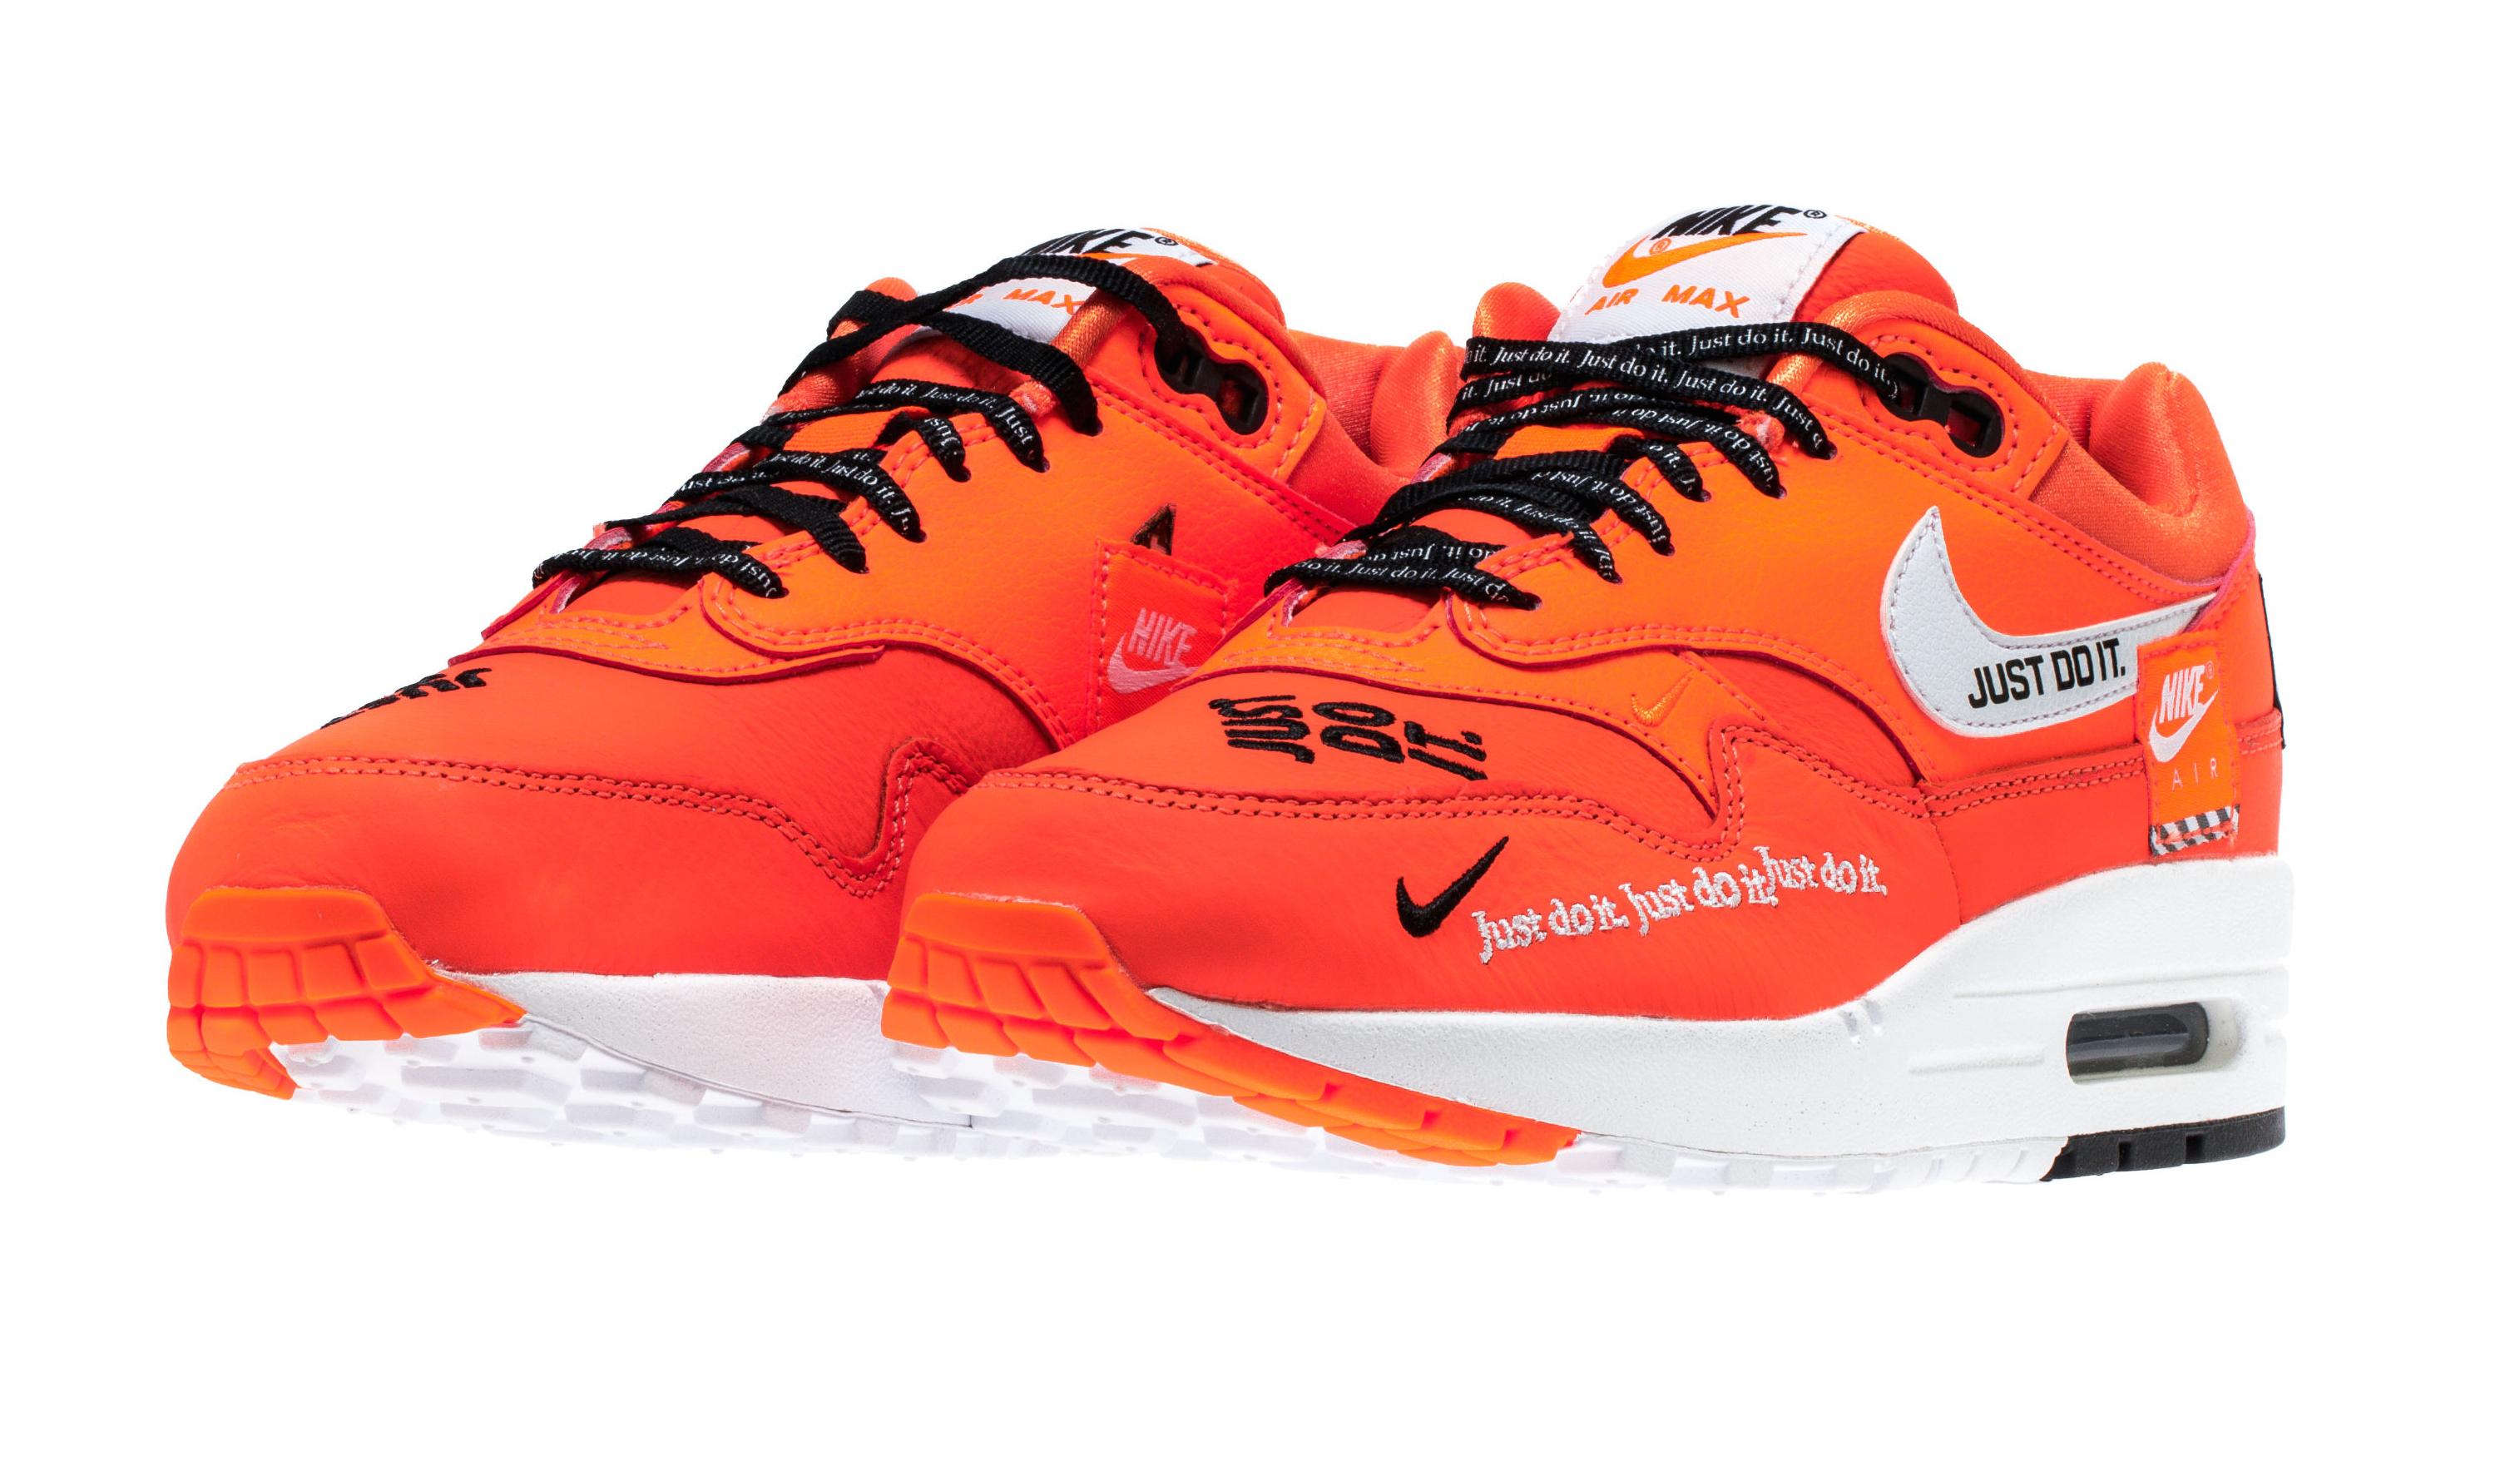 Nike WMNS Air Max 1 Orange Just Do It Arriving Next Week